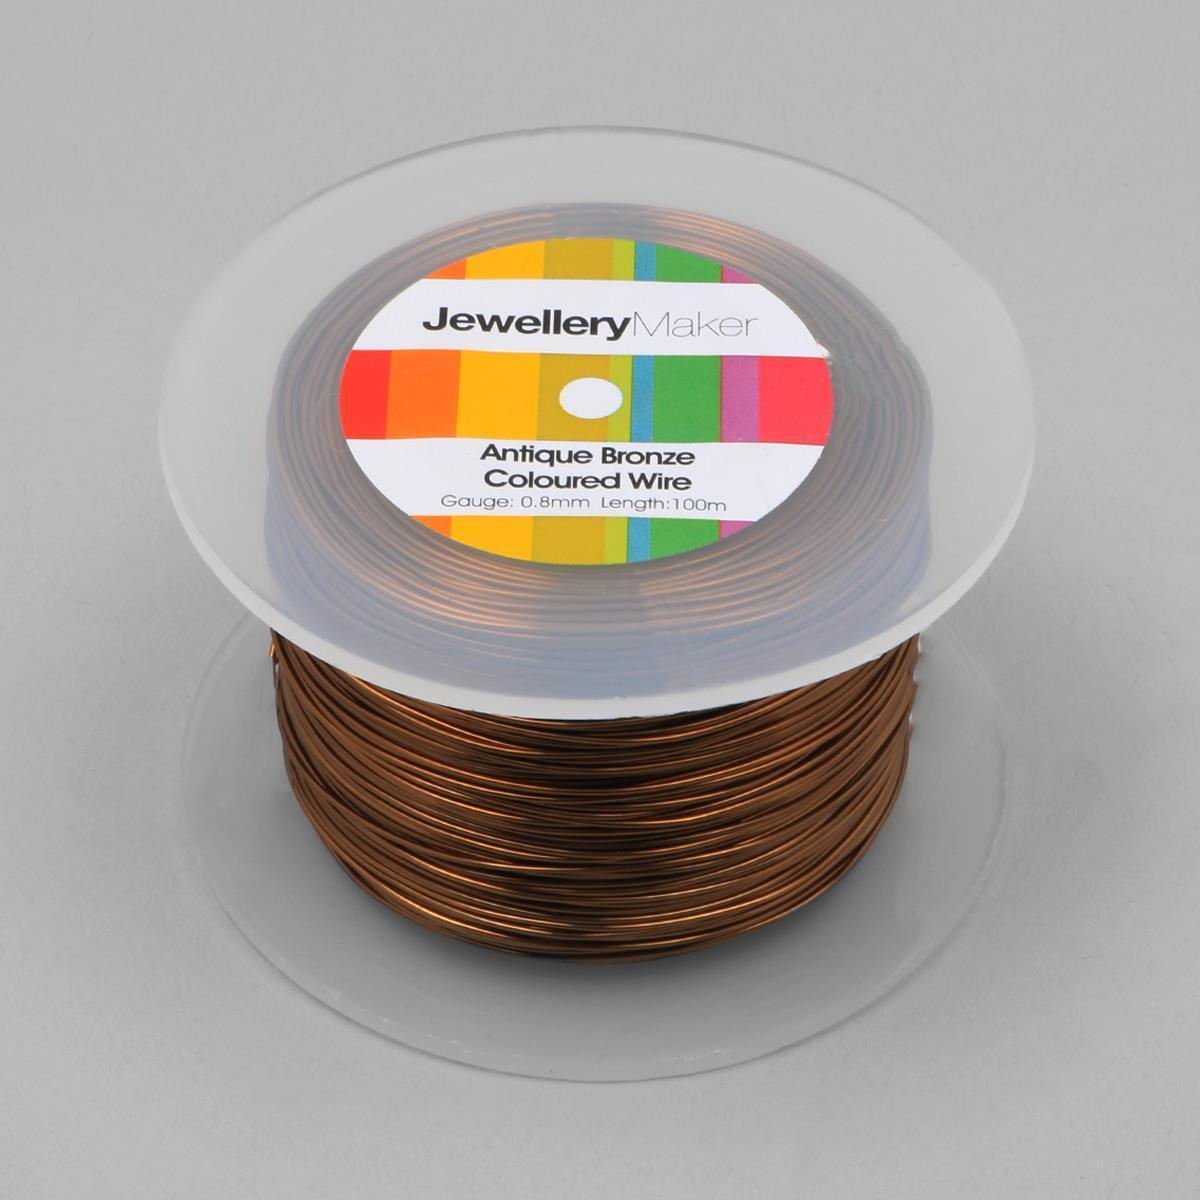 100m Antique Bronze Coloured Copper Wire 08mm Wiring 1